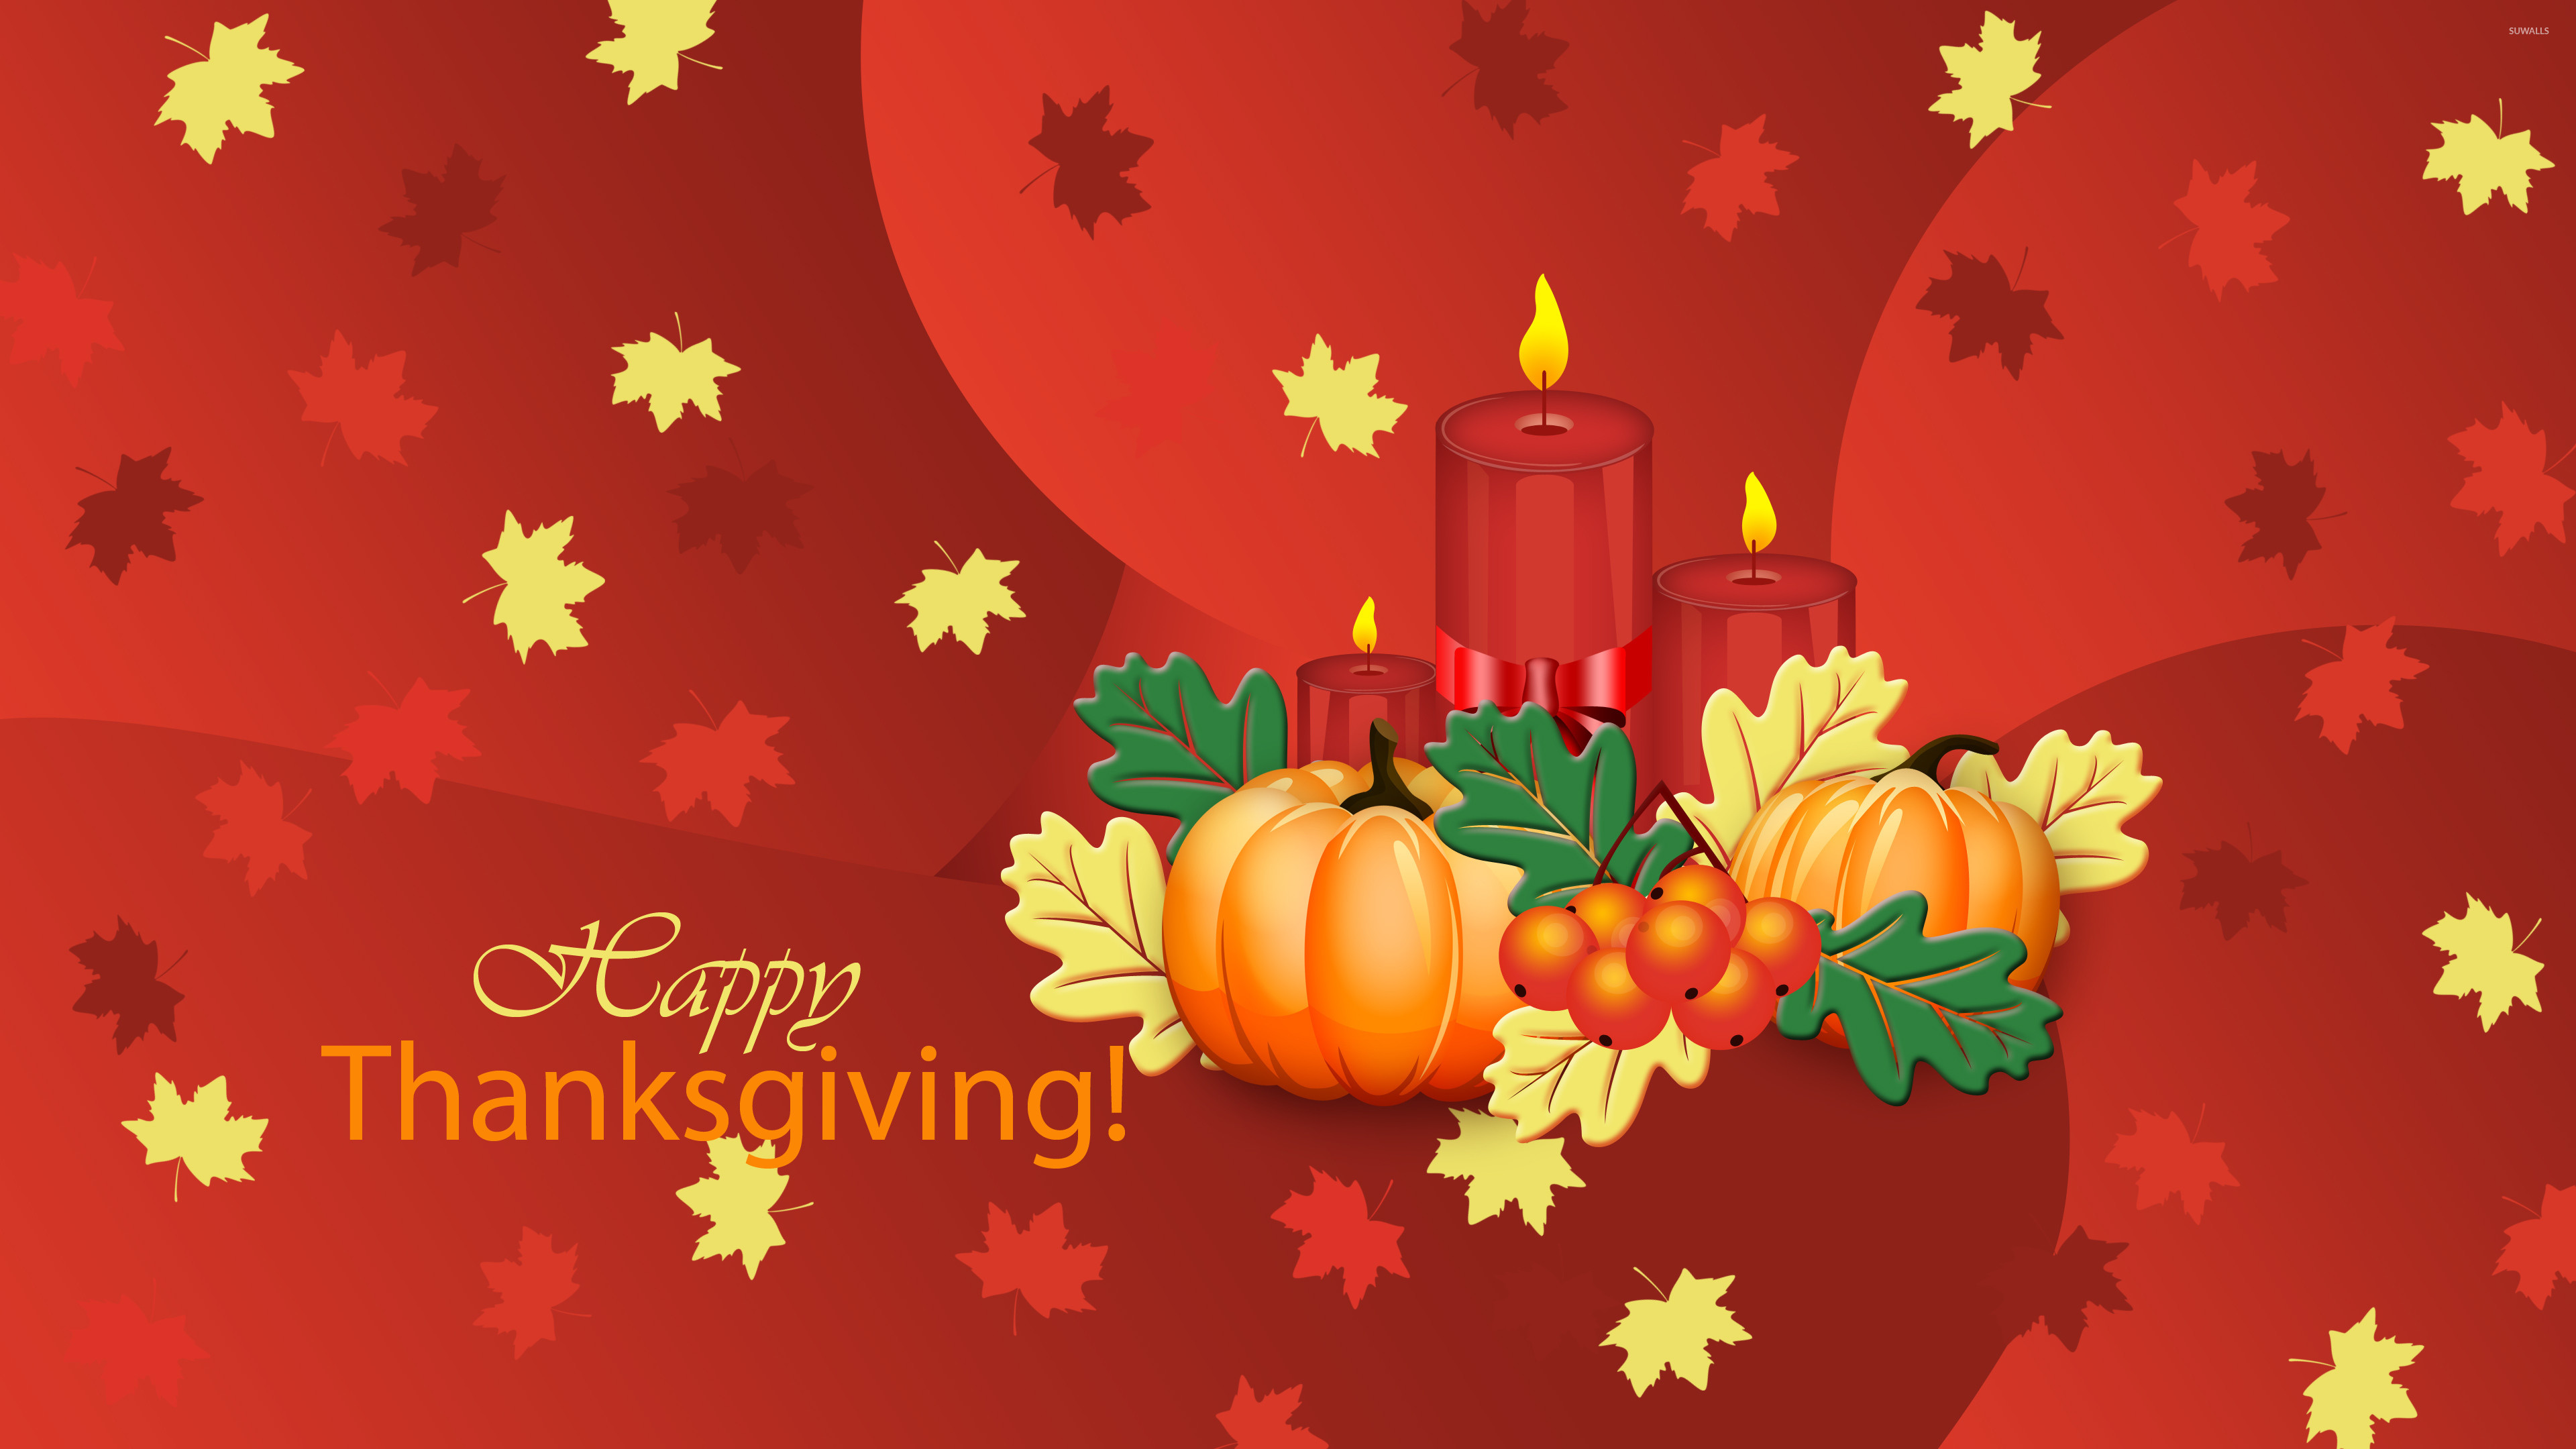 Pumpkins and candles on Thanksgiving wallpaper jpg